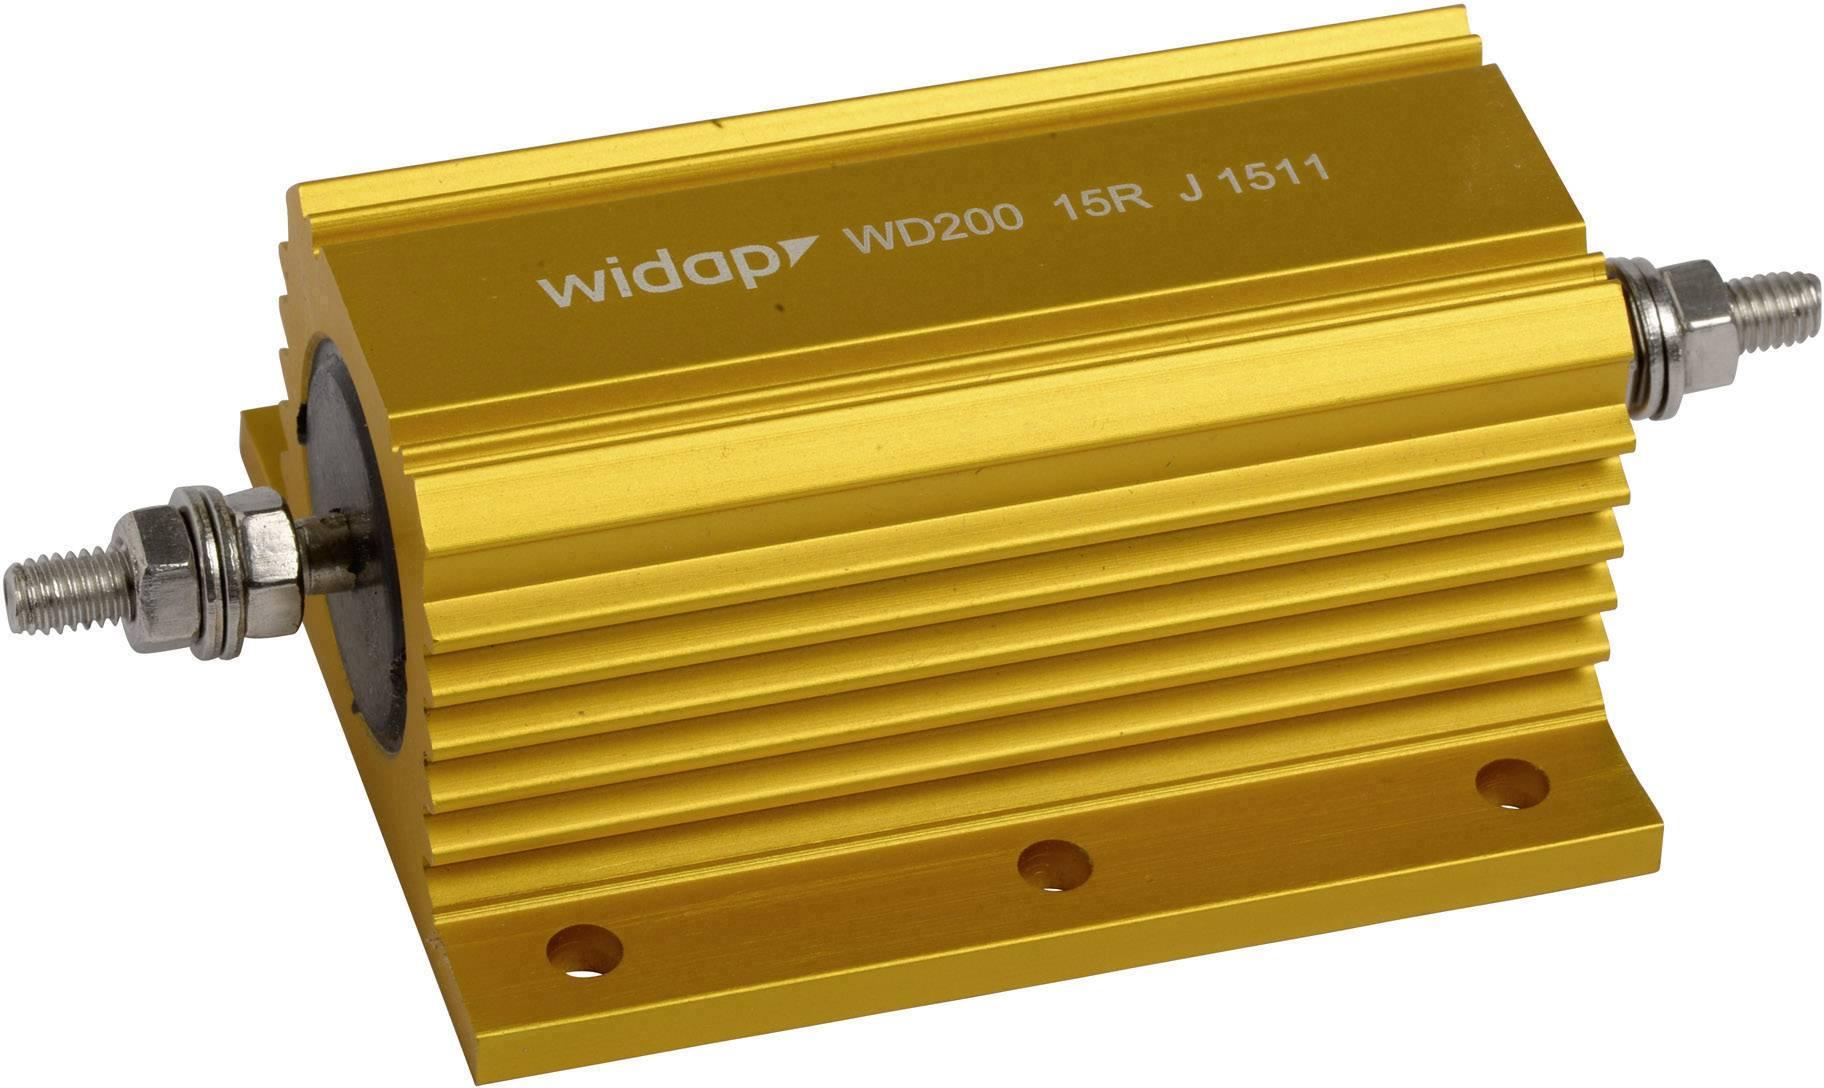 Drôtový rezistor Widap 160180, hodnota odporu 150 Ohm, 300 W, 1 ks